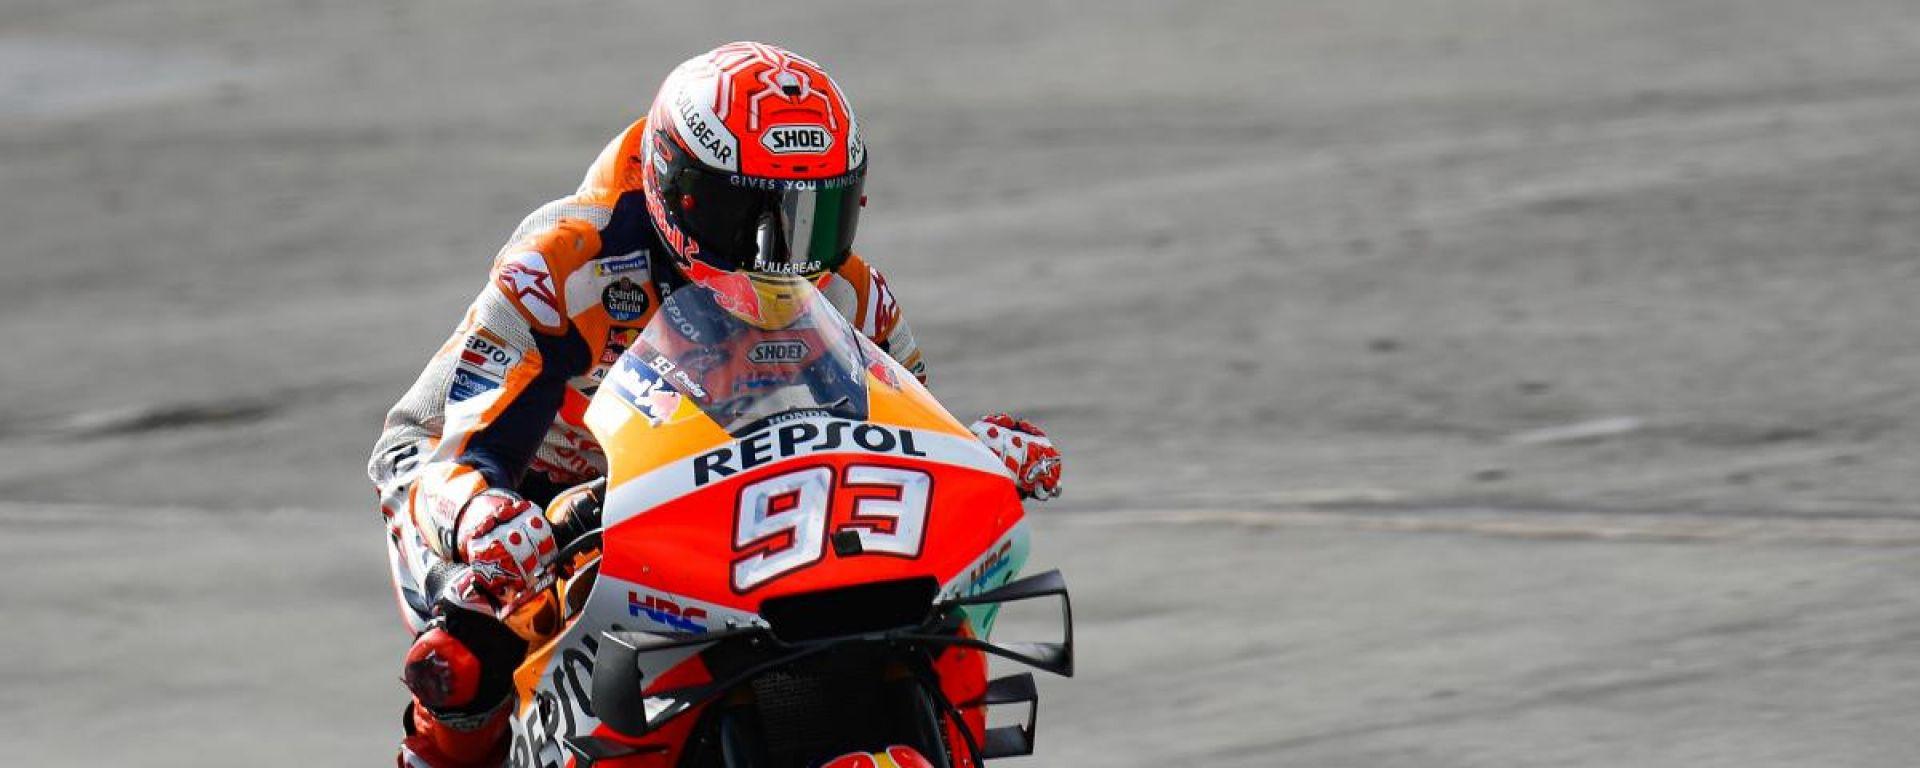 MotoGP Silverstone, Marquez in pole. Rossi 2°